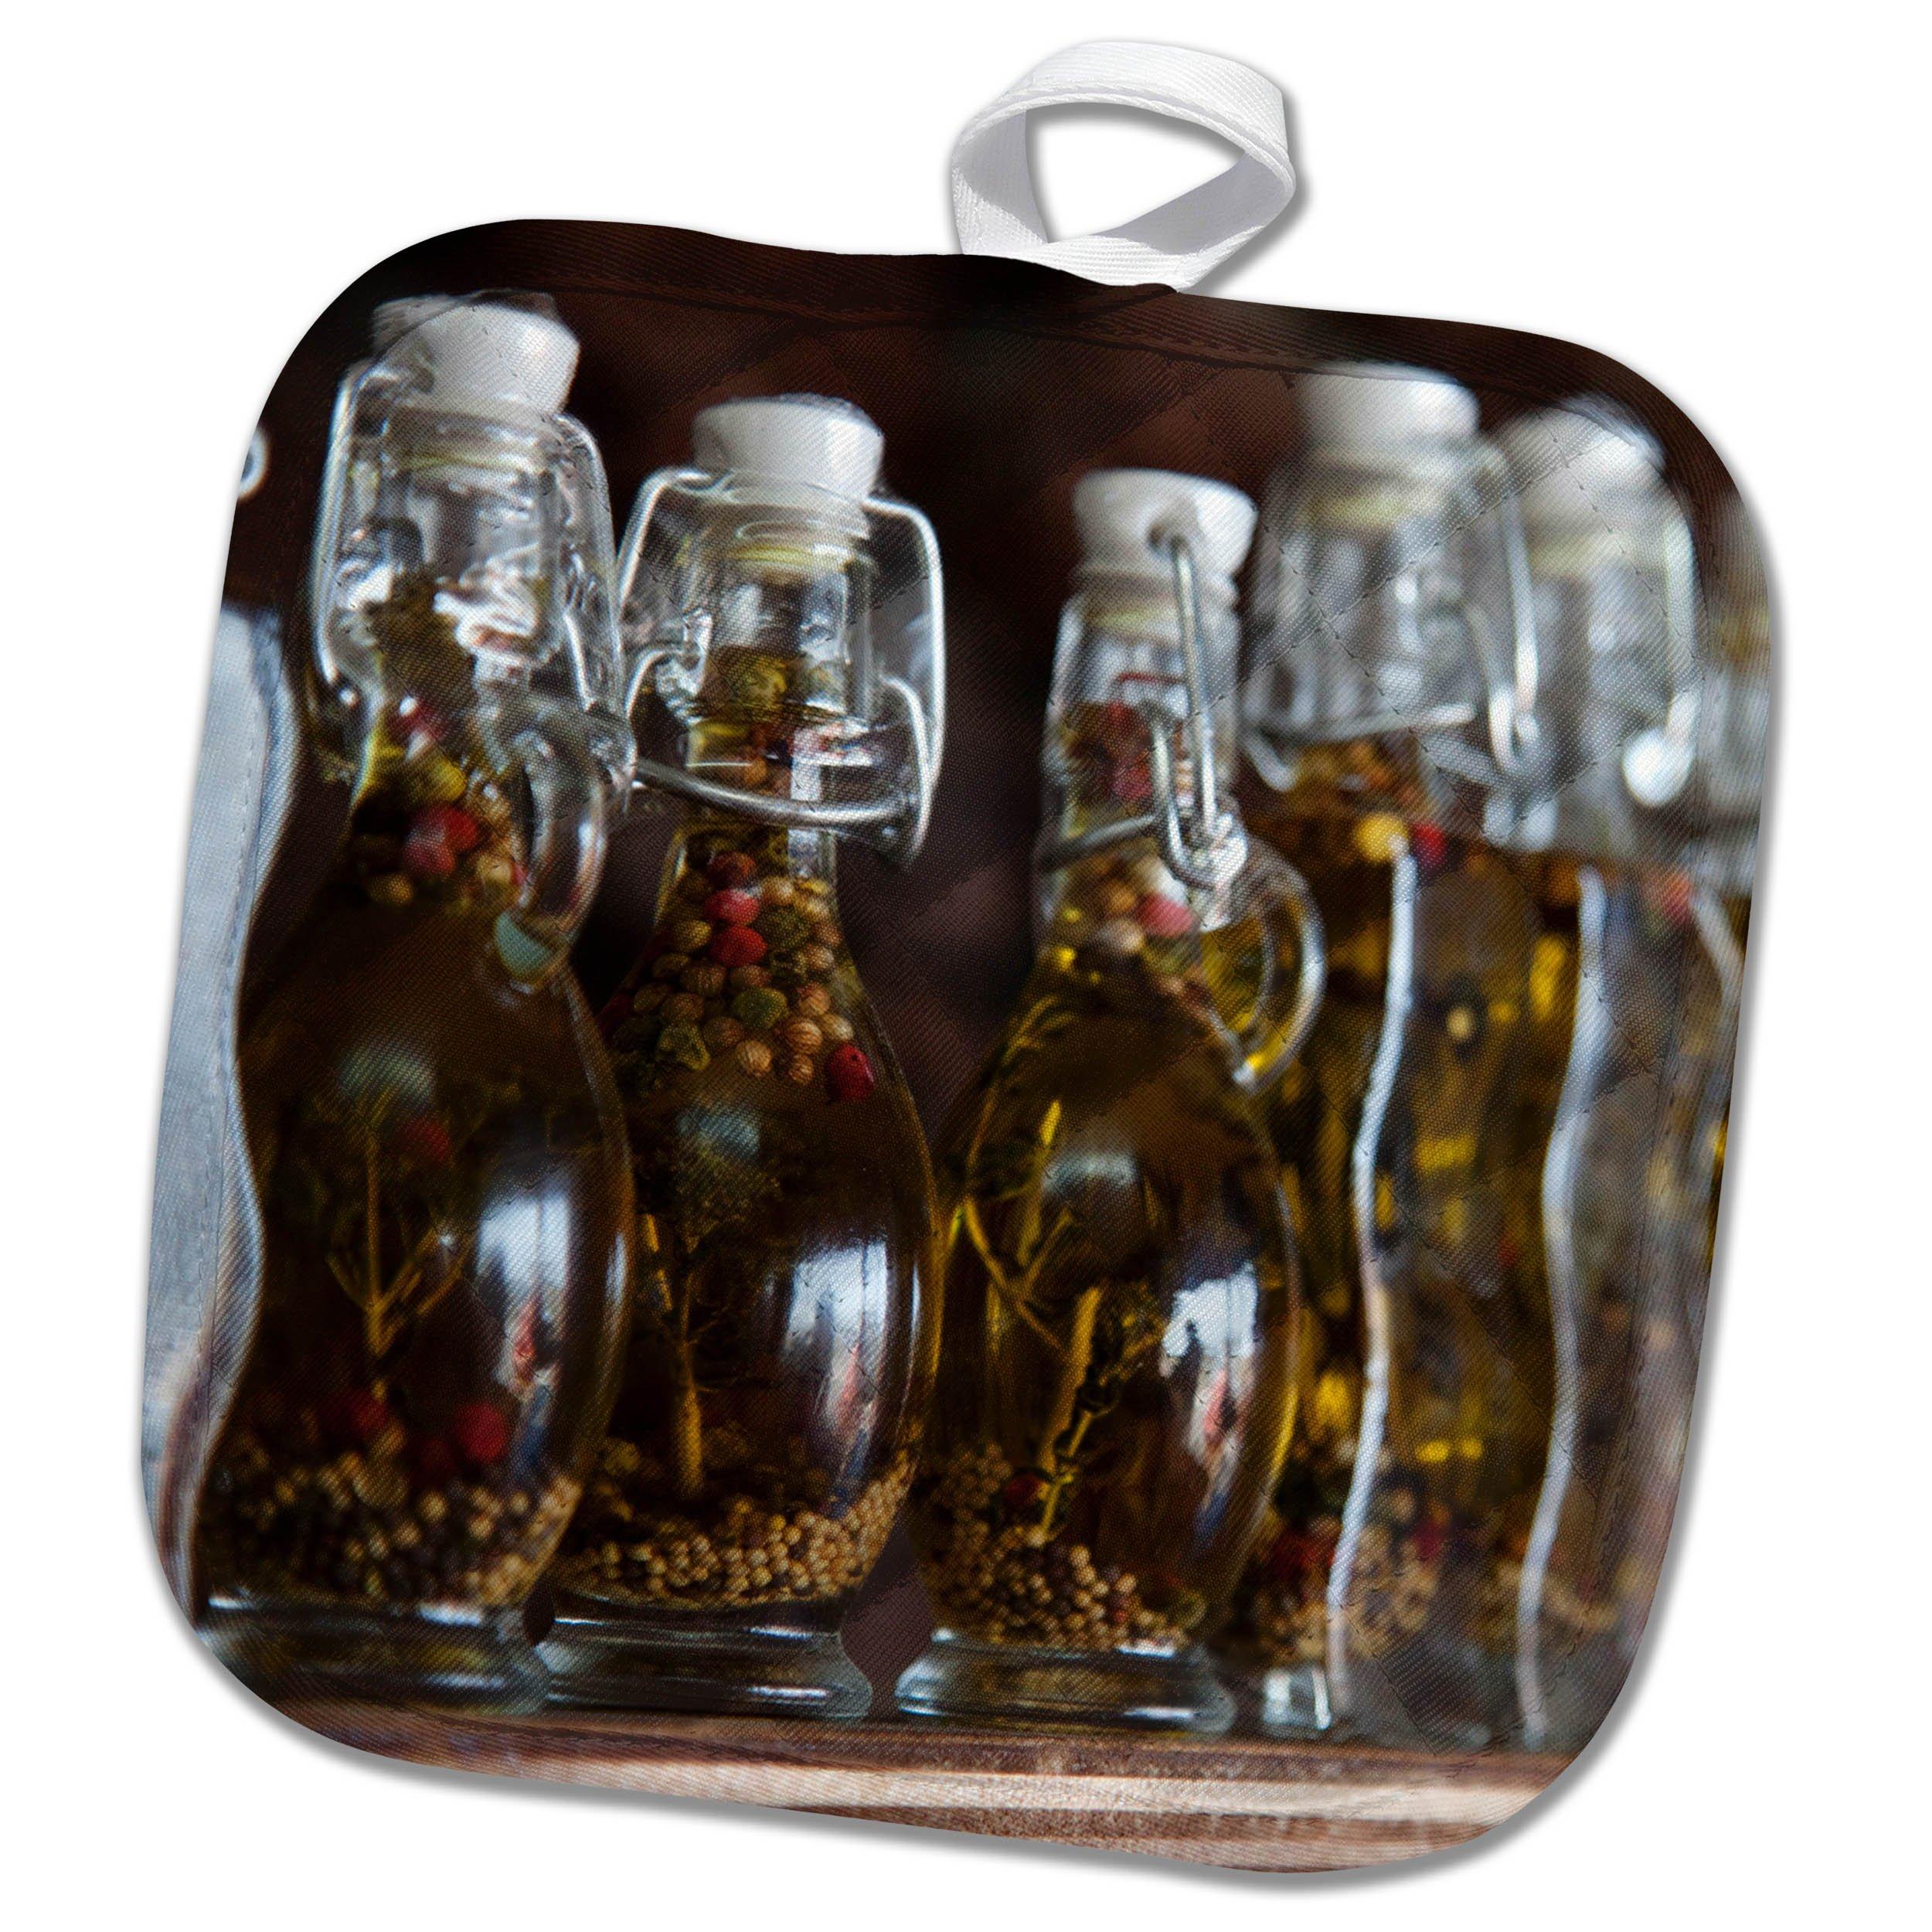 3dRose Danita Delimont - Food - Greece, Santorini. Row of bottles of oil and seasonings - 8x8 Potholder (phl_277437_1)